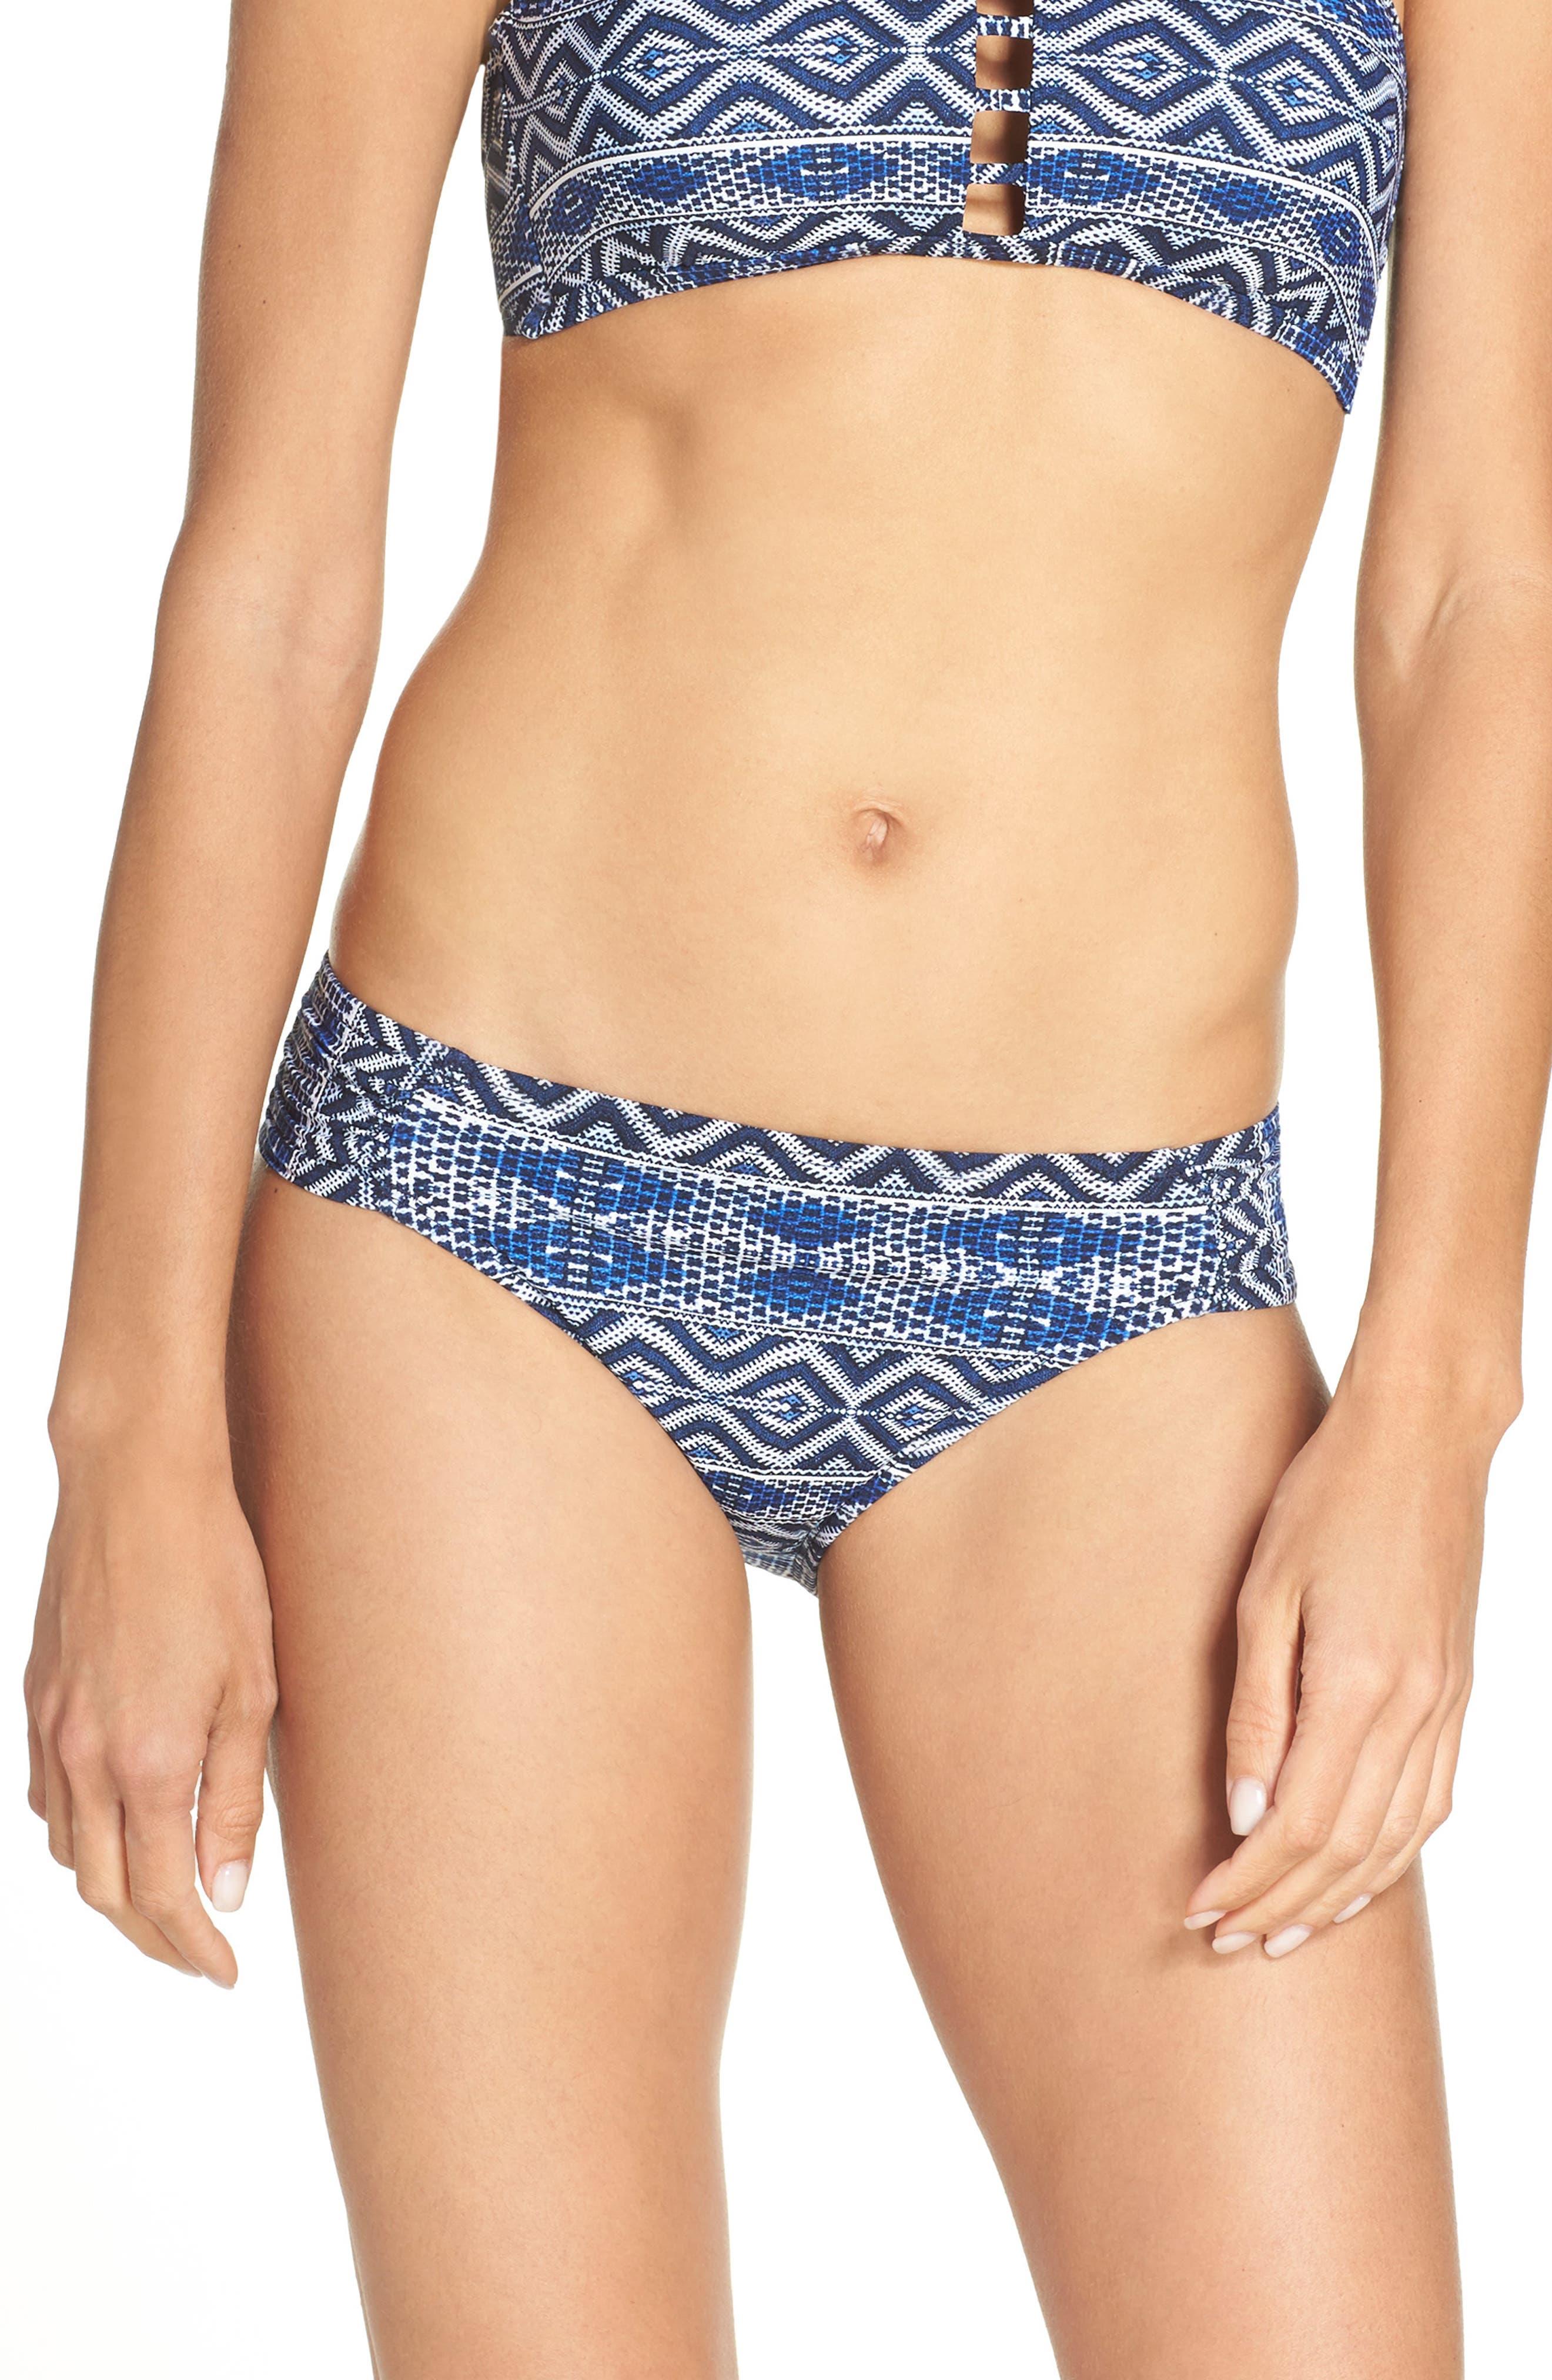 Designer Jeans Hipster Bikini Bottoms,                         Main,                         color, 401